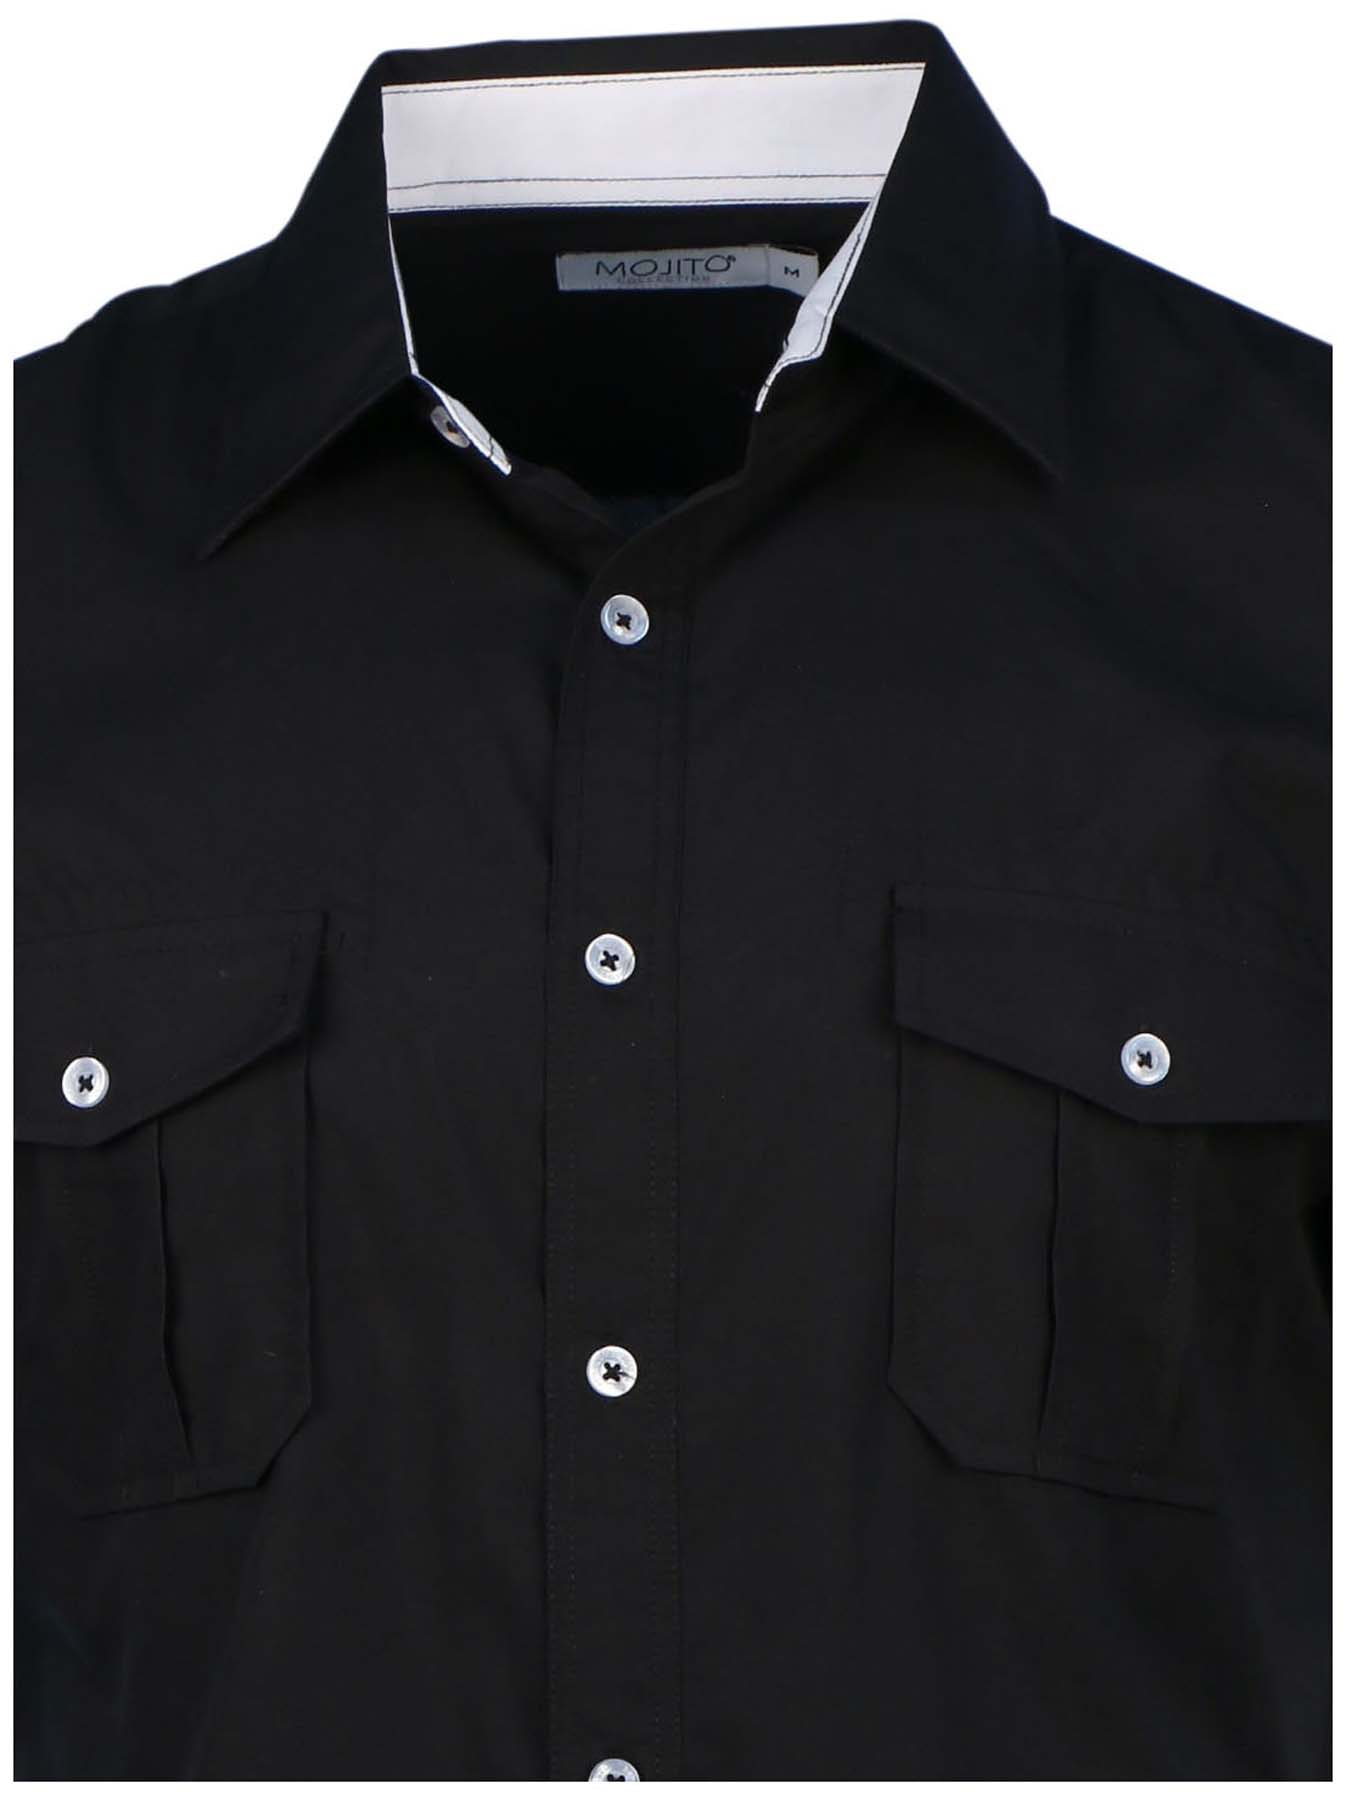 Mens Short Sleeve Western Shirts